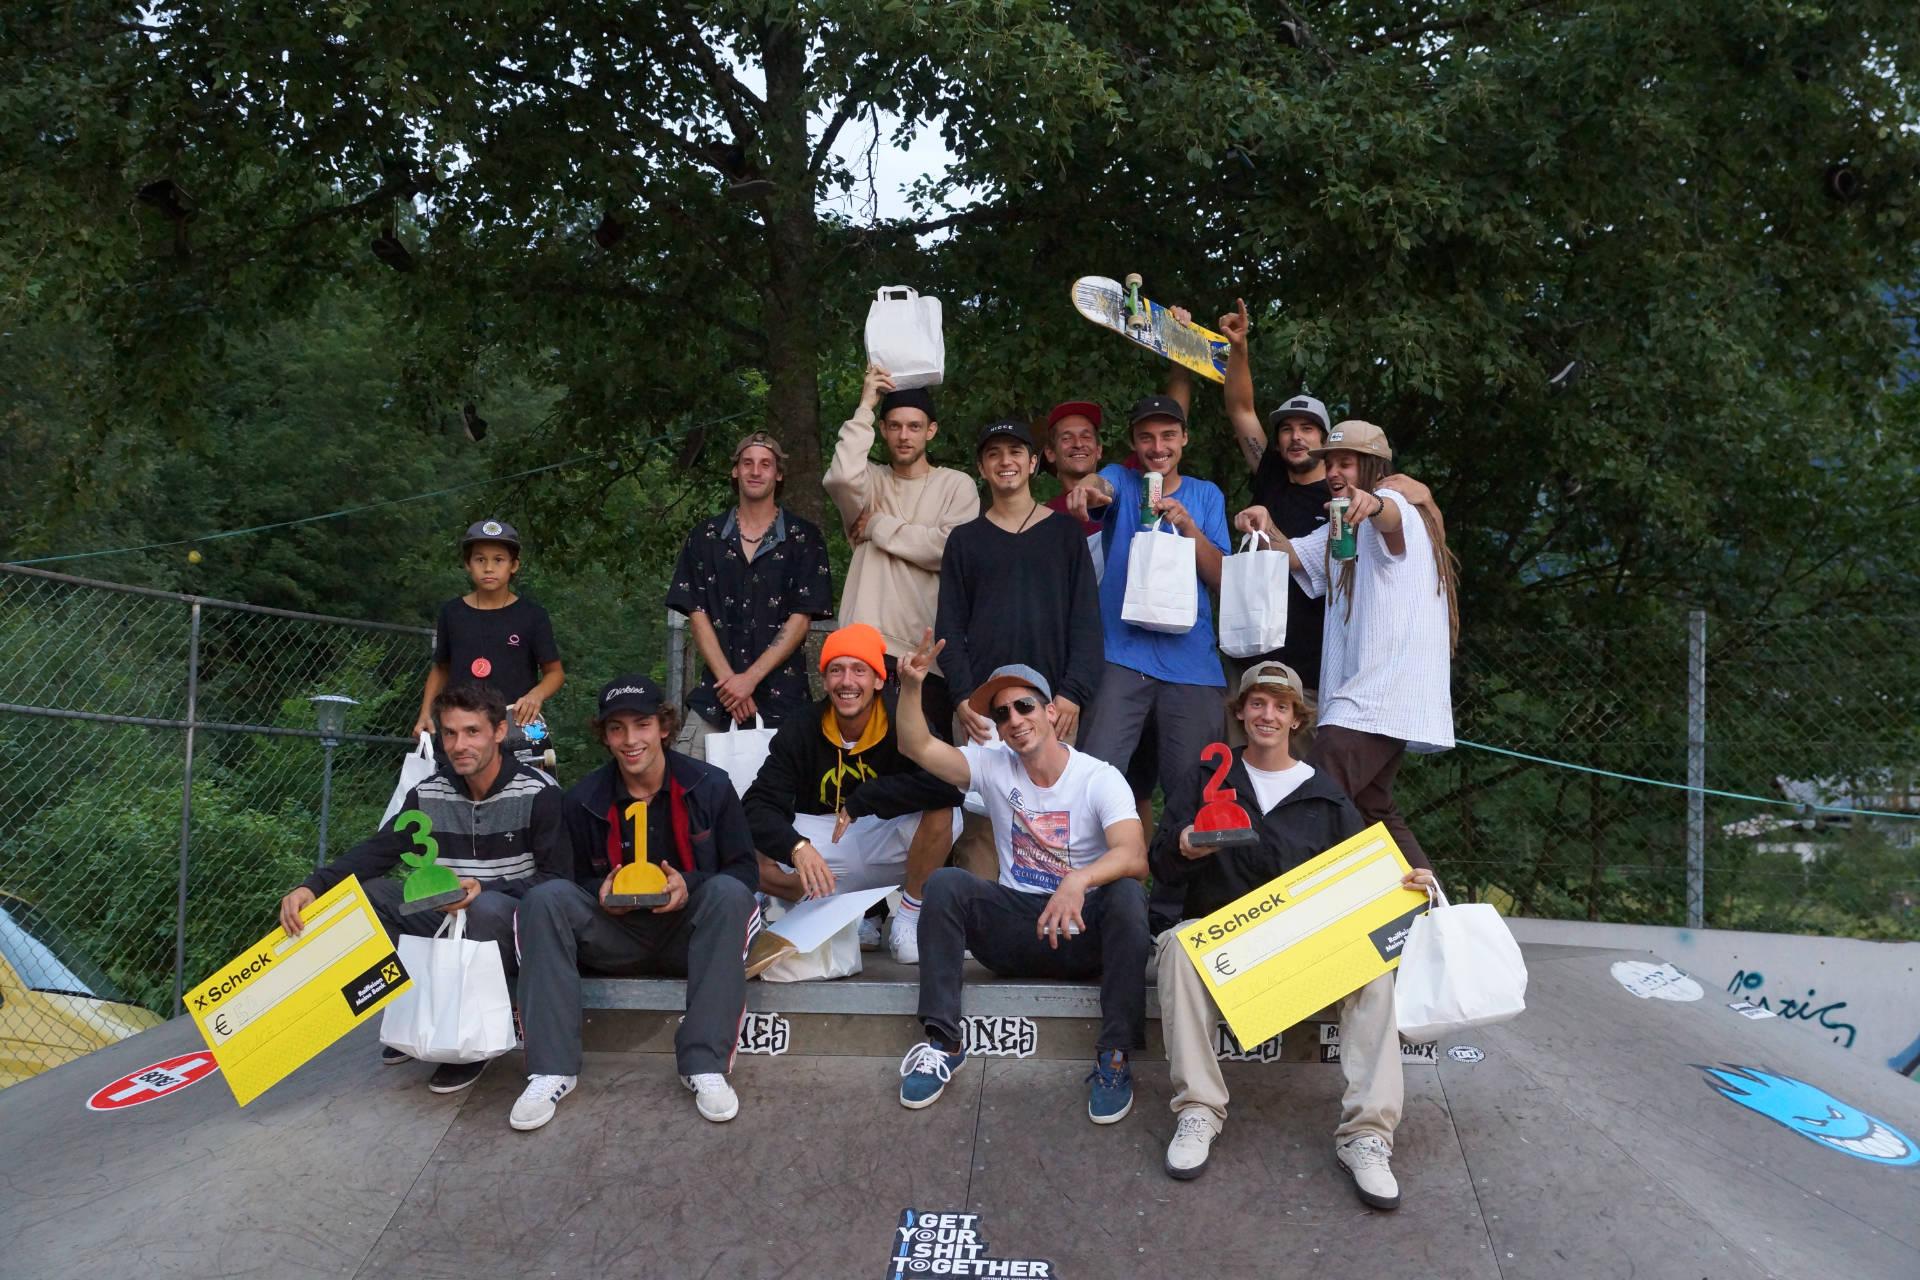 skateboardheadz fieberbrunn kgt 2019 finale 00058